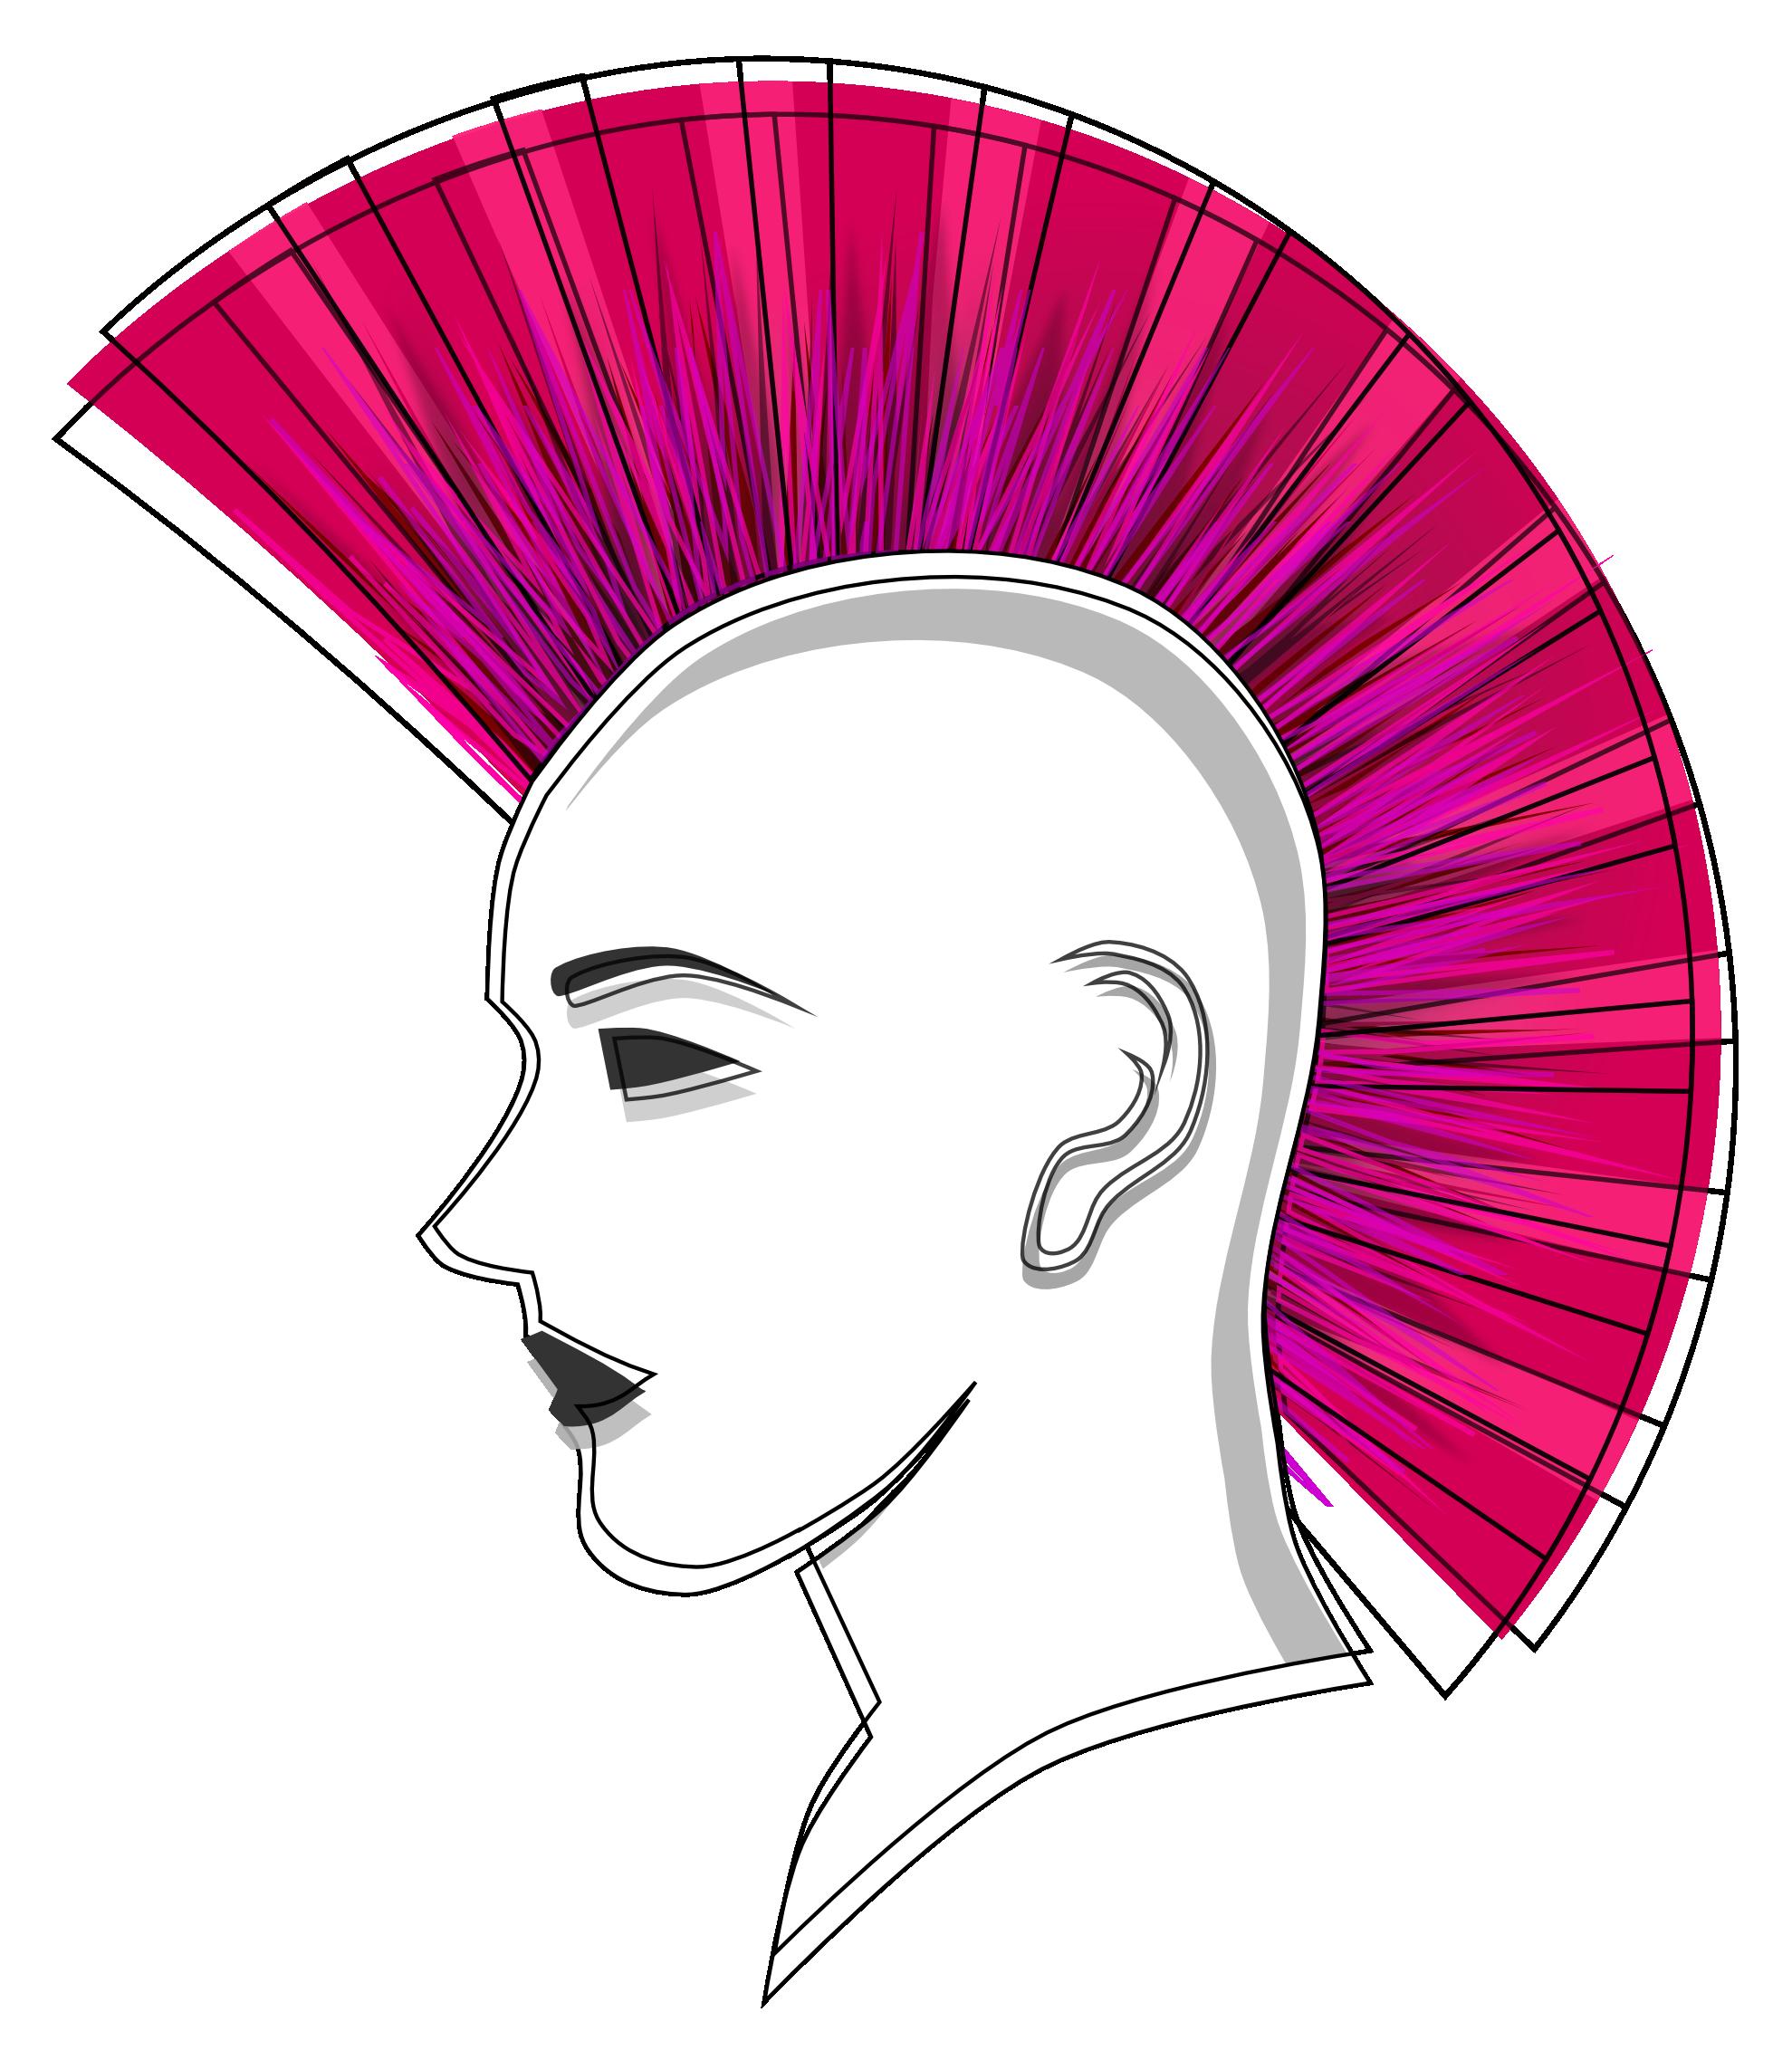 Mohawk clipart spiky hair Clipart Download Mohawk Clipart Mohawk